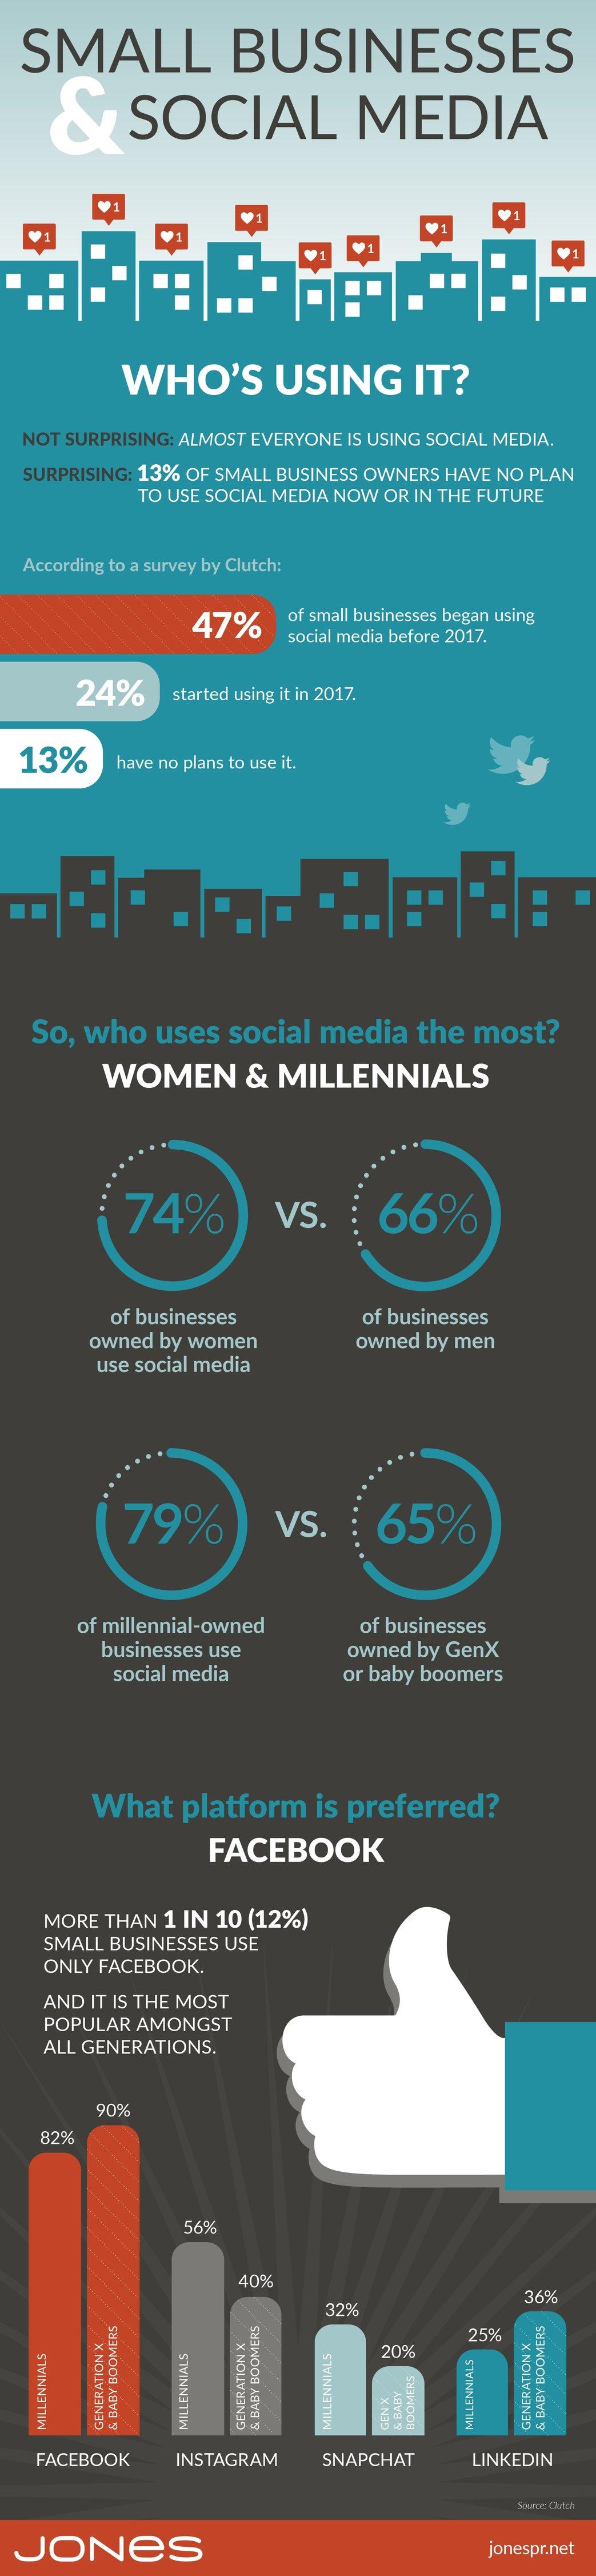 jones-infographic-small-biz-who-uses-social-media-01-1